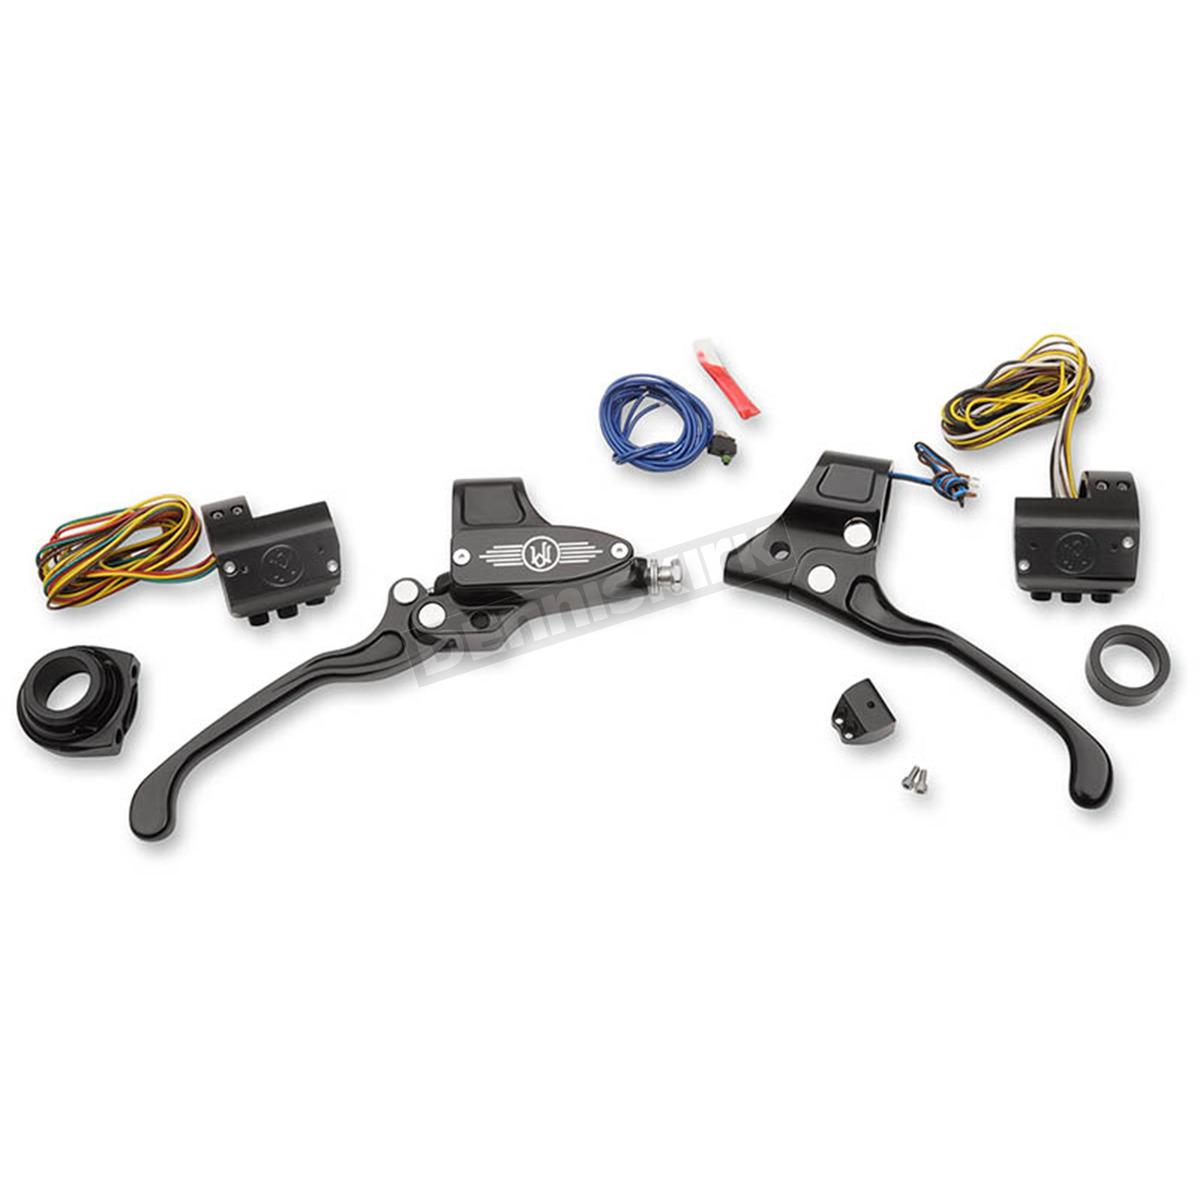 Performance Machine Black Complete Handlebar Control Kit w